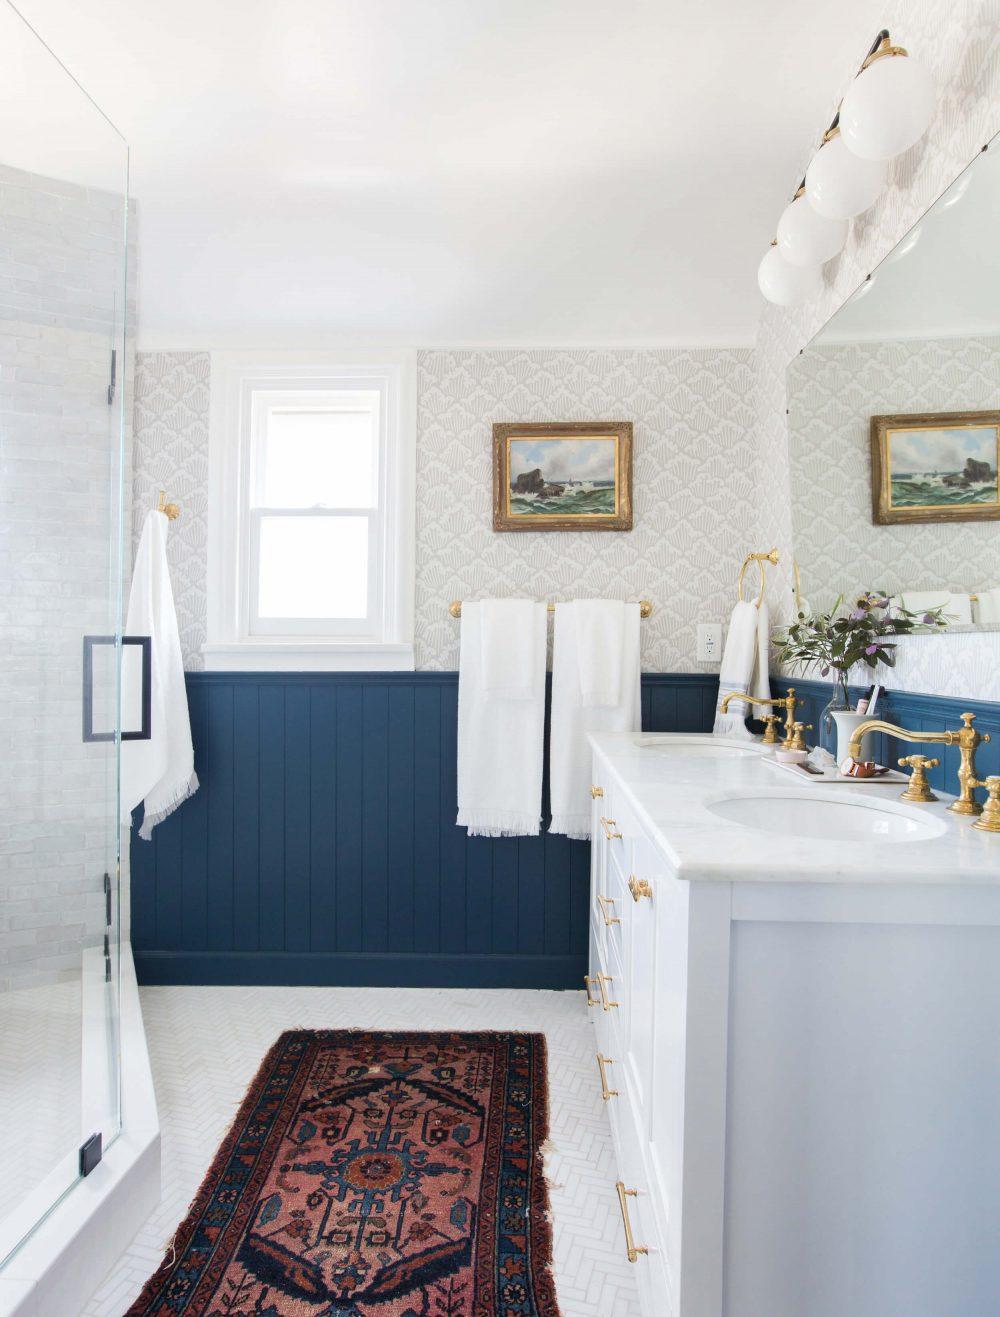 45 Master Bathroom Ideas 2019 (That Will Awe You) 30